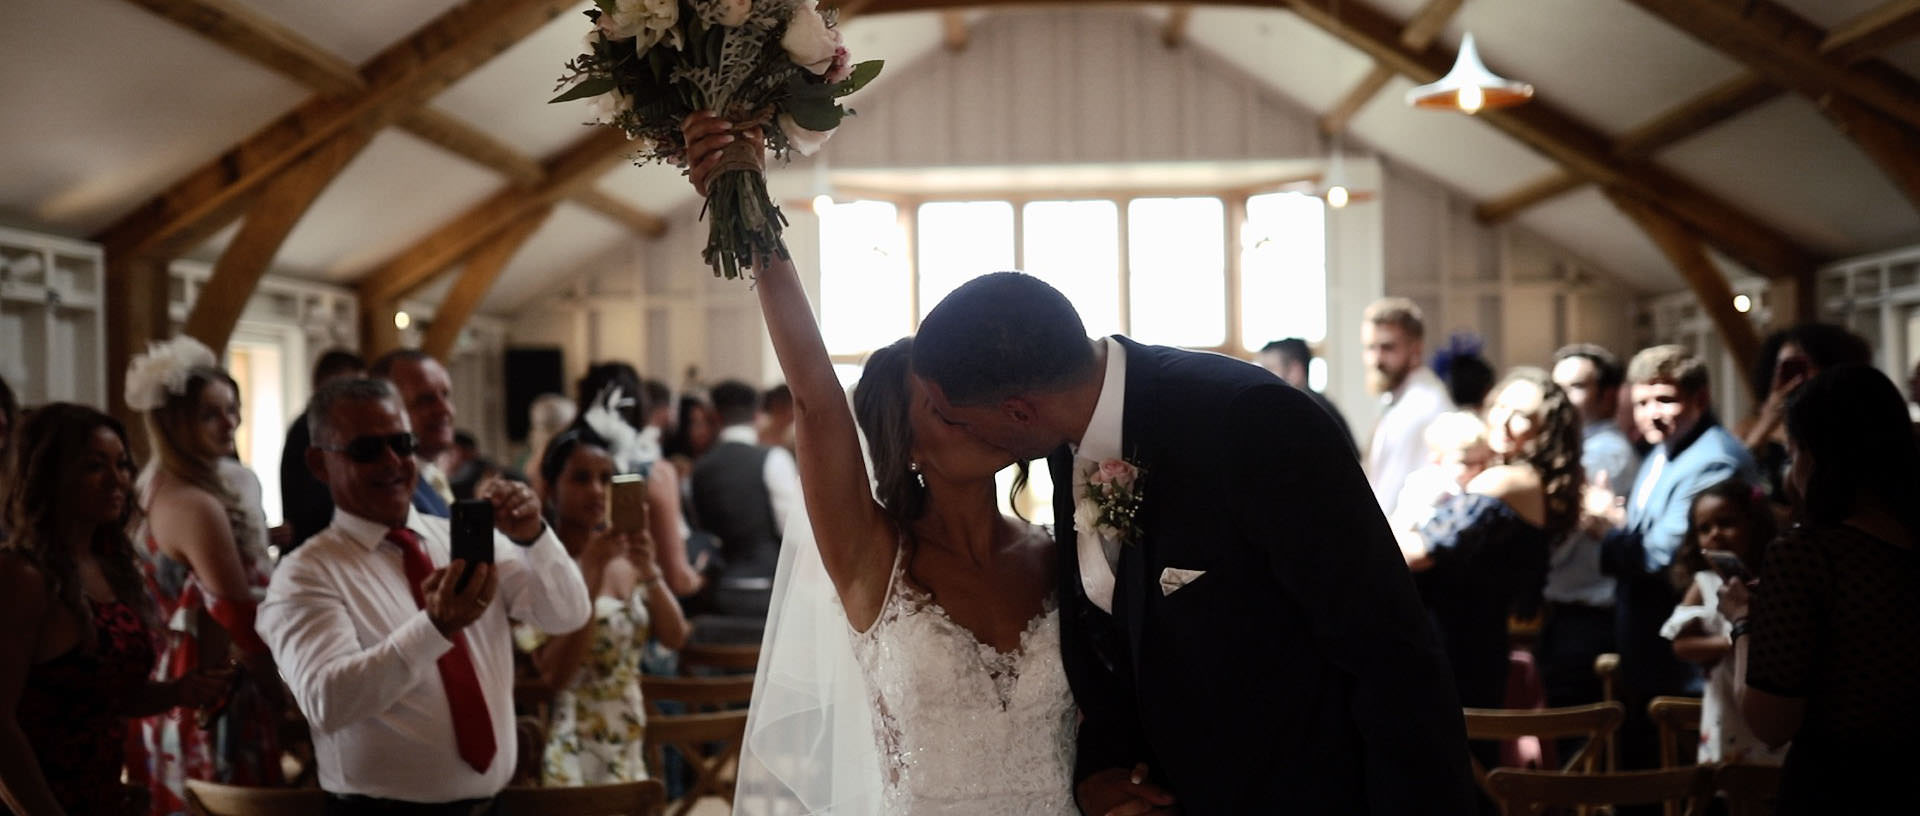 Hyde Barn Colswolds Wedding Verity-Jade & Kai 25 Cropped.jpg